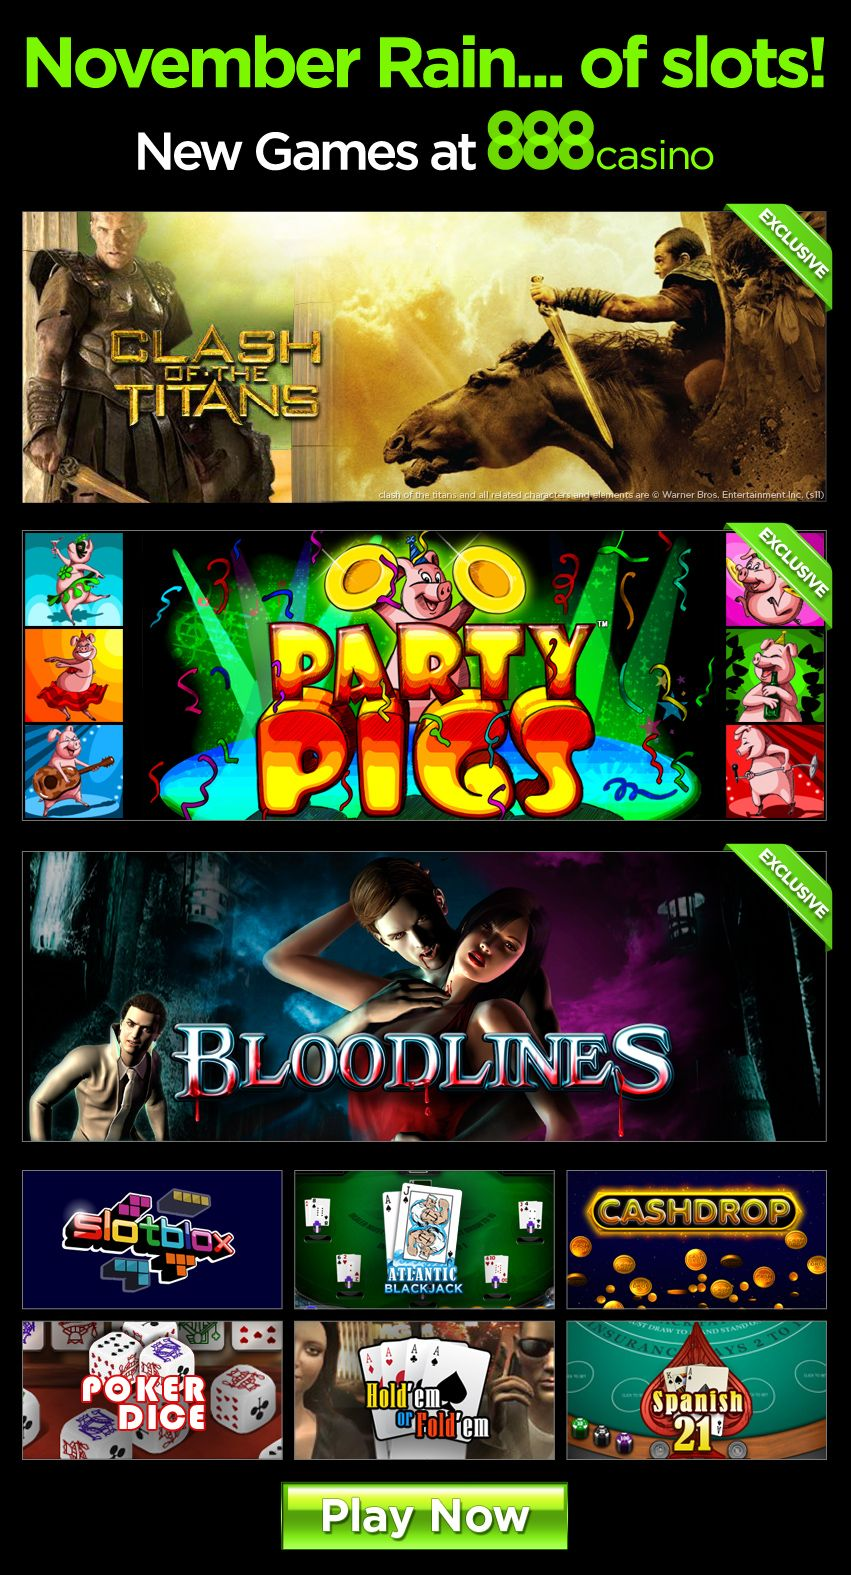 New Video Poker Games